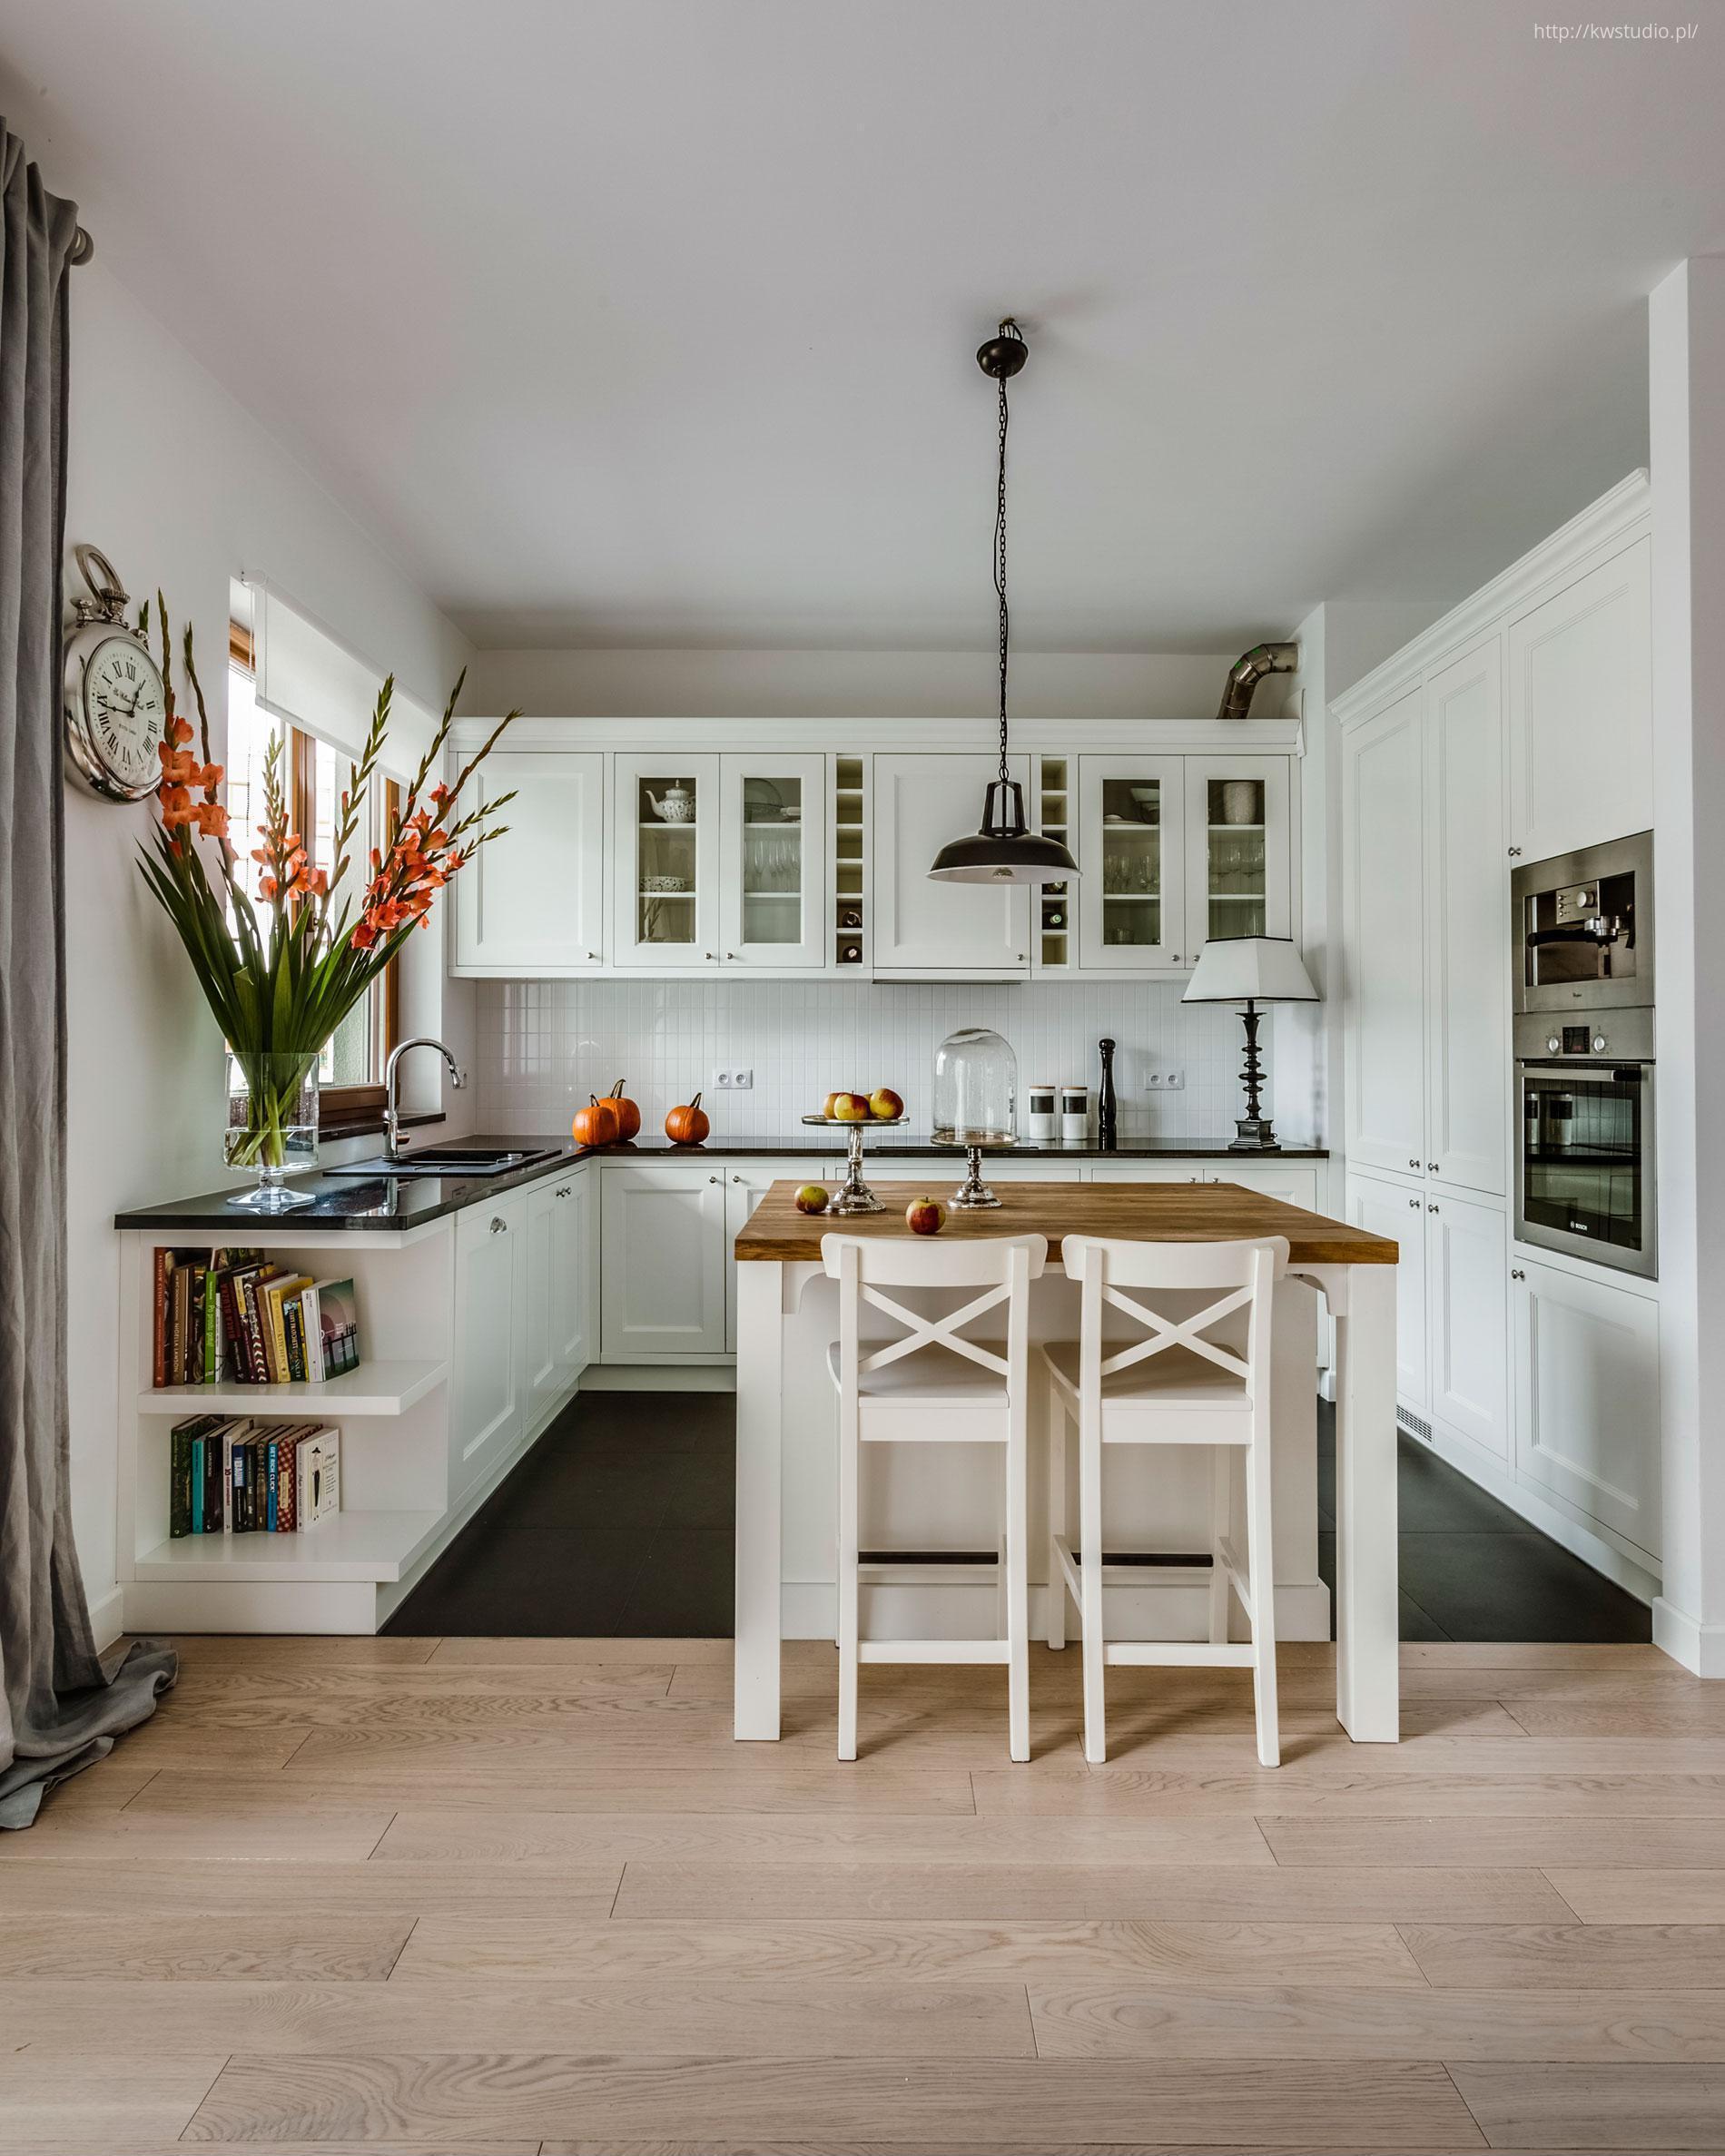 Fehér konyha // HOMEINFO.hu - Inspirációtár